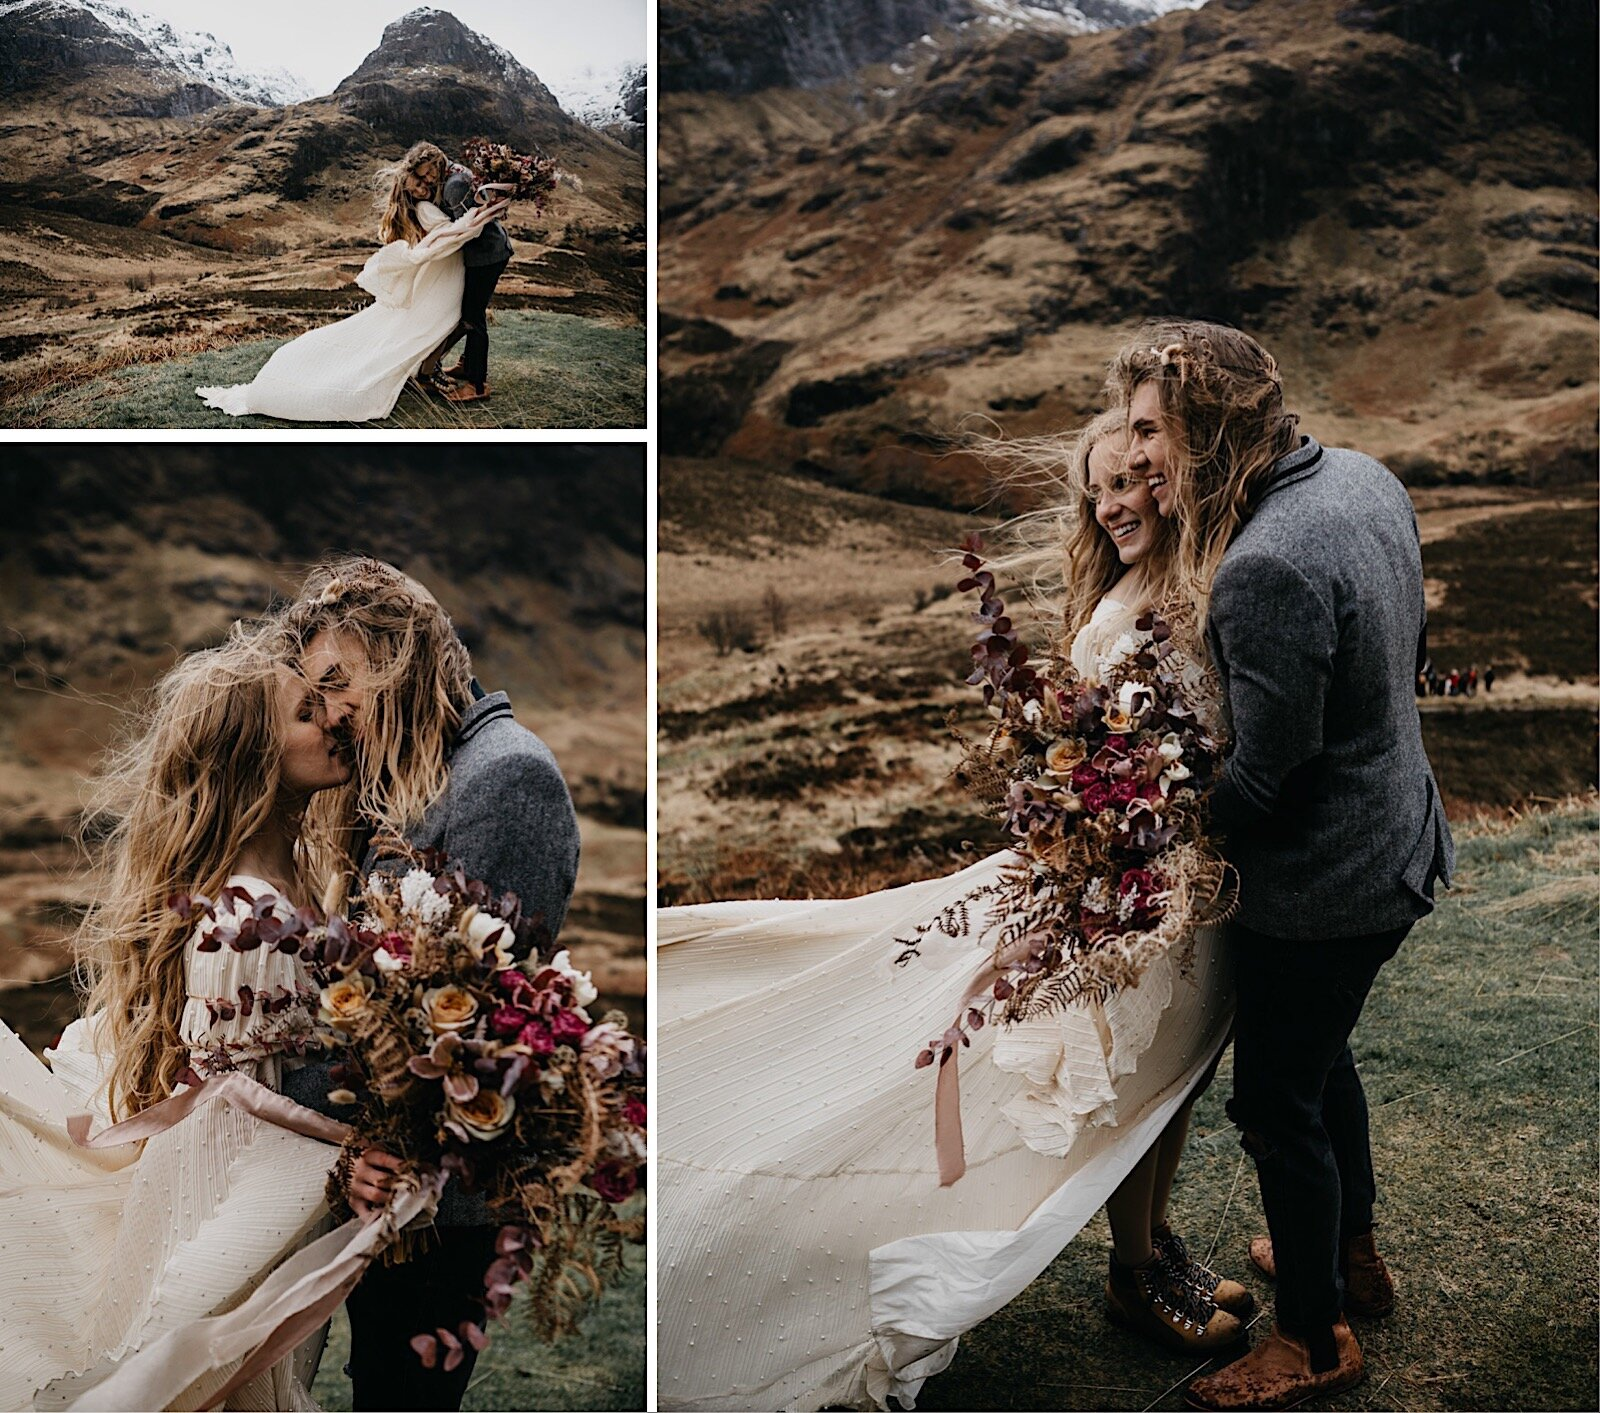 14_scotland_couple_shoot_lety_photography (8 von 39)_scotland_couple_shoot_lety_photography (16 von 39)_scotland_couple_shoot_lety_photography (9 von 39).jpg